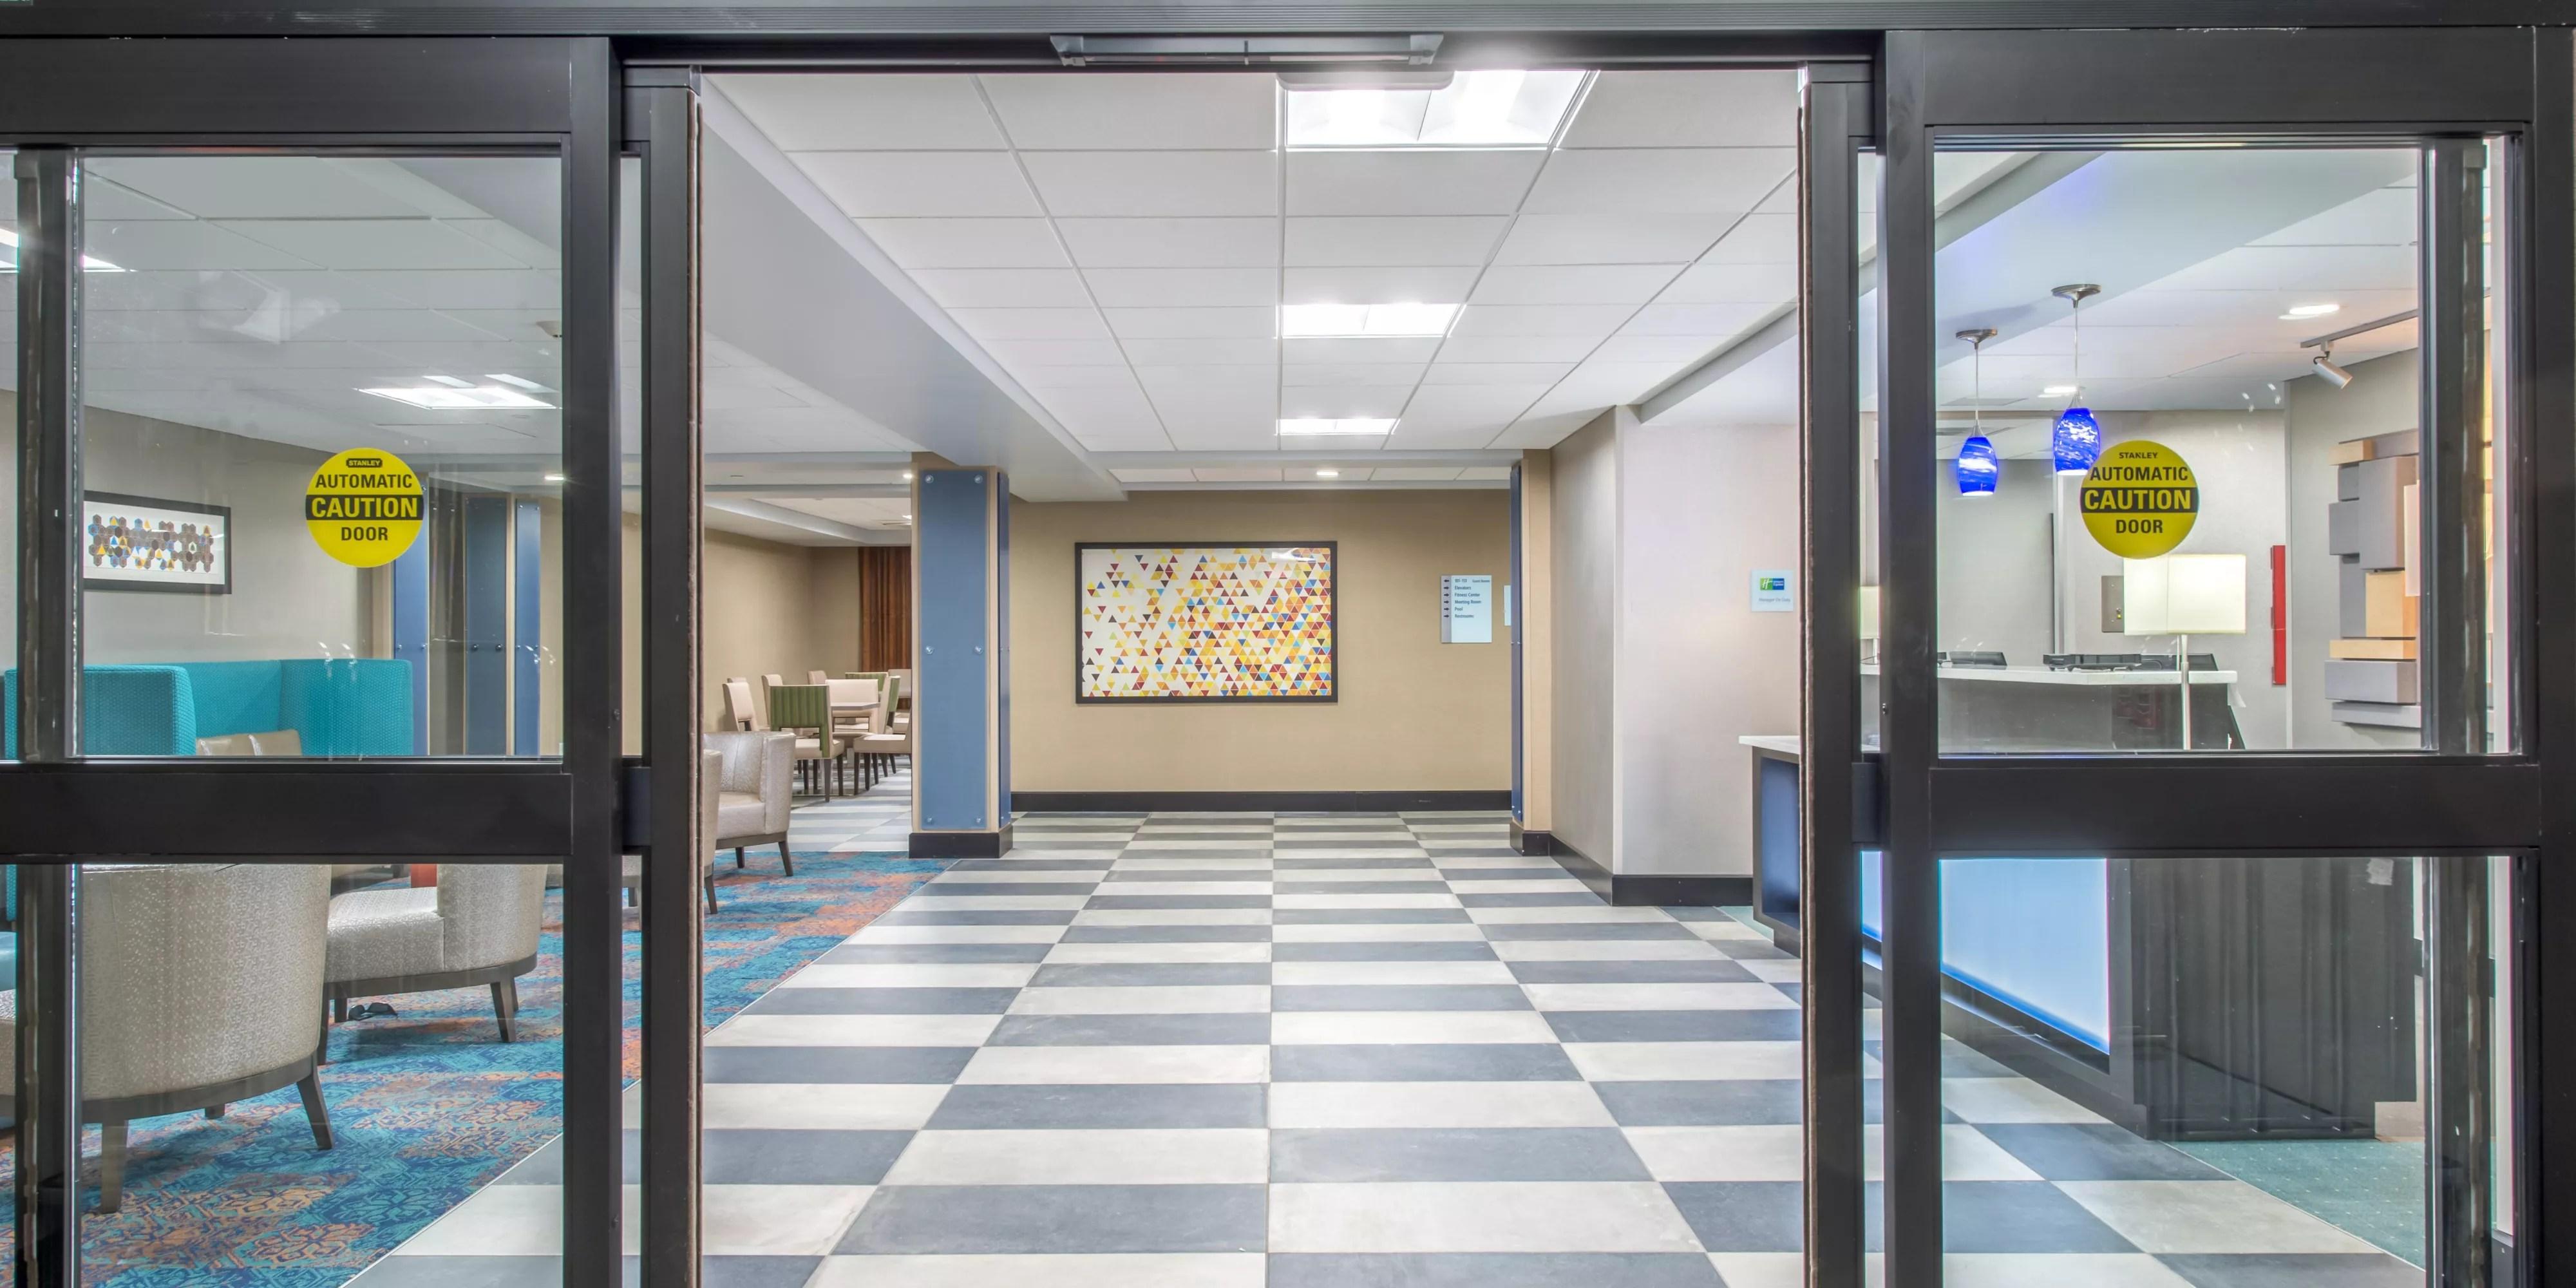 Holiday Inn Express Suites Shawnee Kansas City West